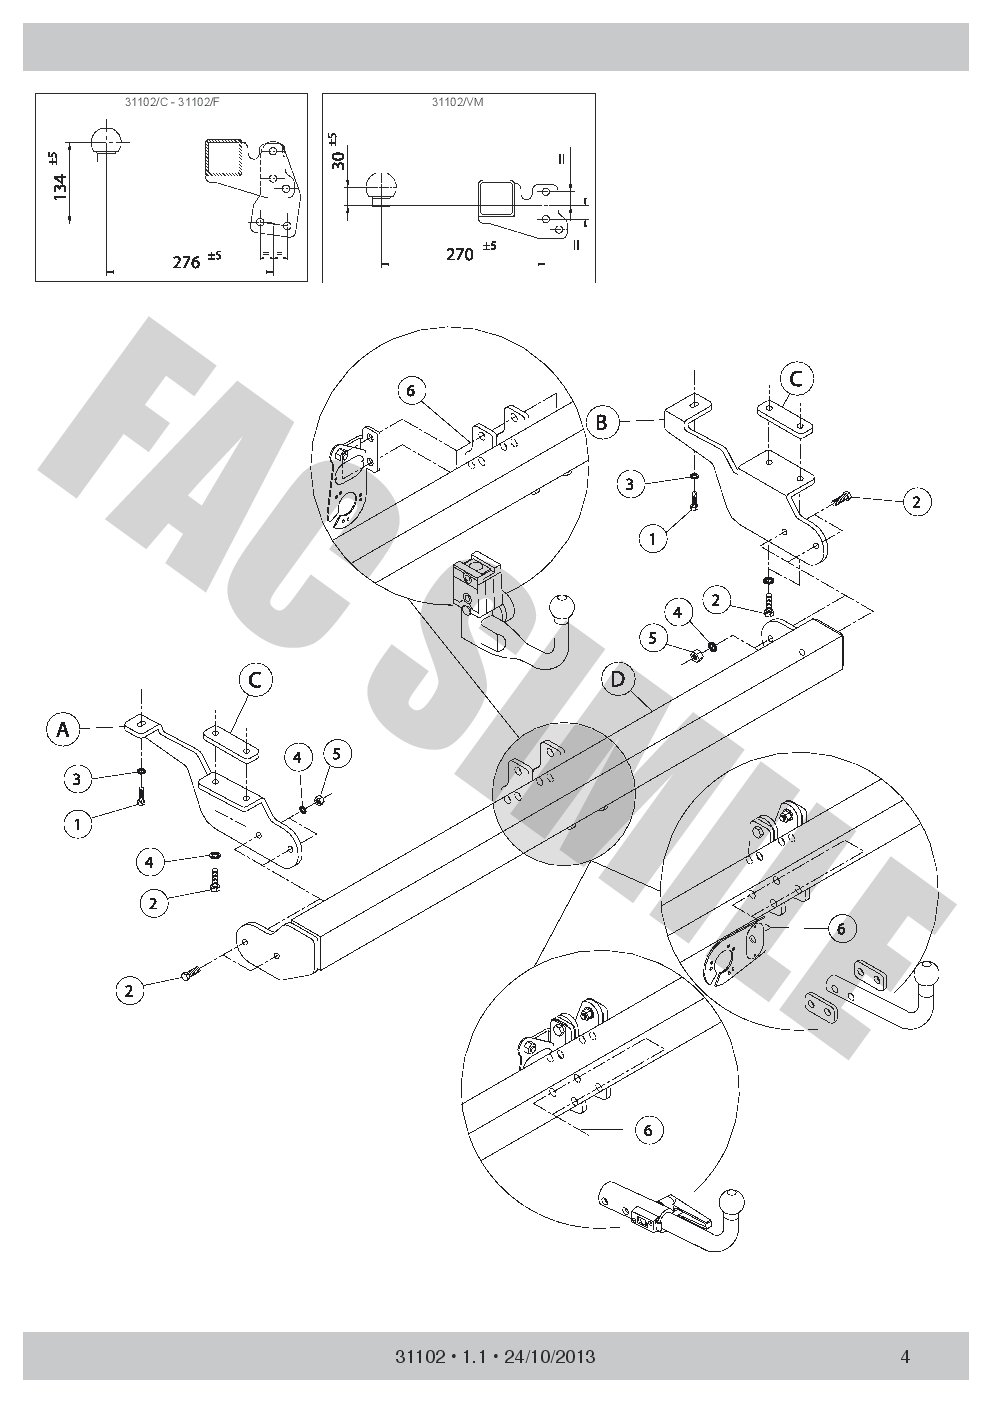 AHK Abnehmbare Anhängerkupplung 7p C2 E-Satz Mercedes Citan Van 12 31102/_B2